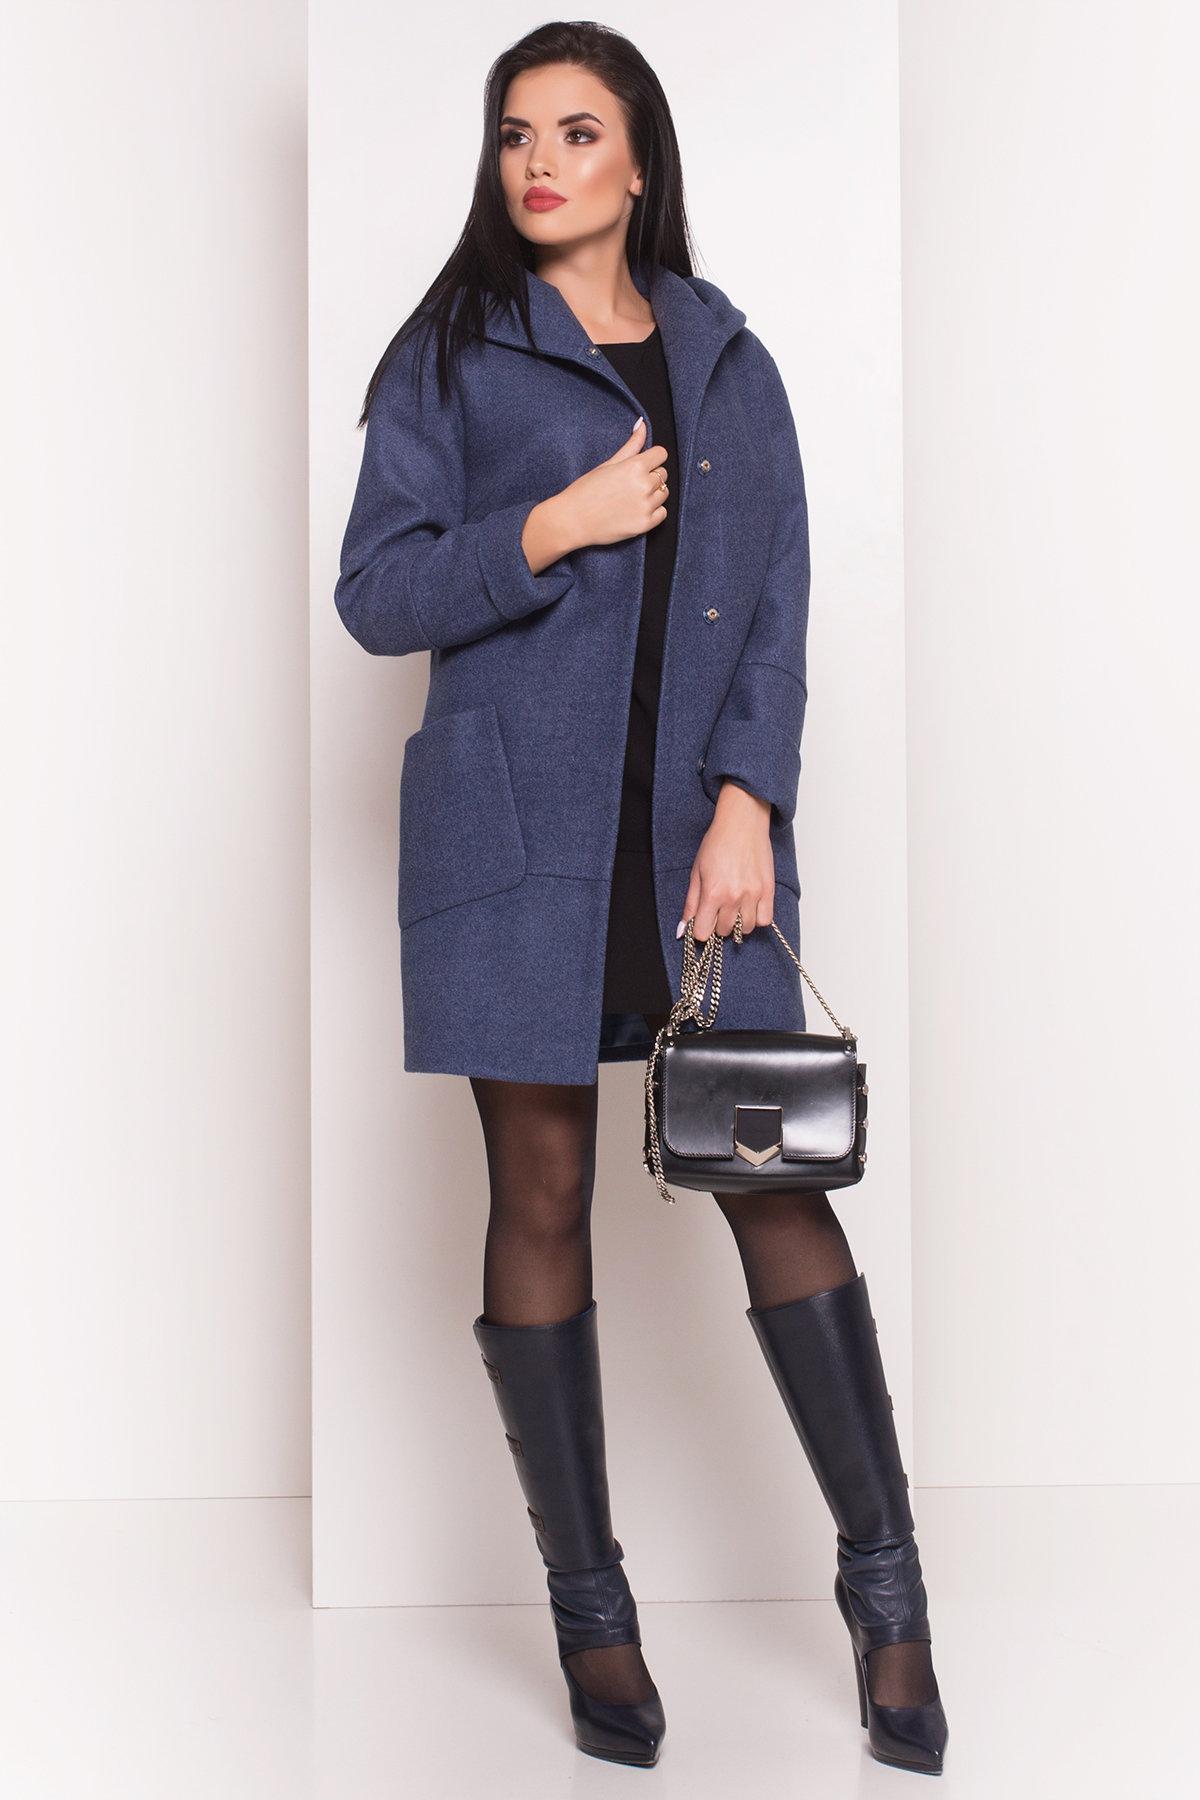 Купити Пальто Анита 4416 оптом в Україні  5f96224017dda